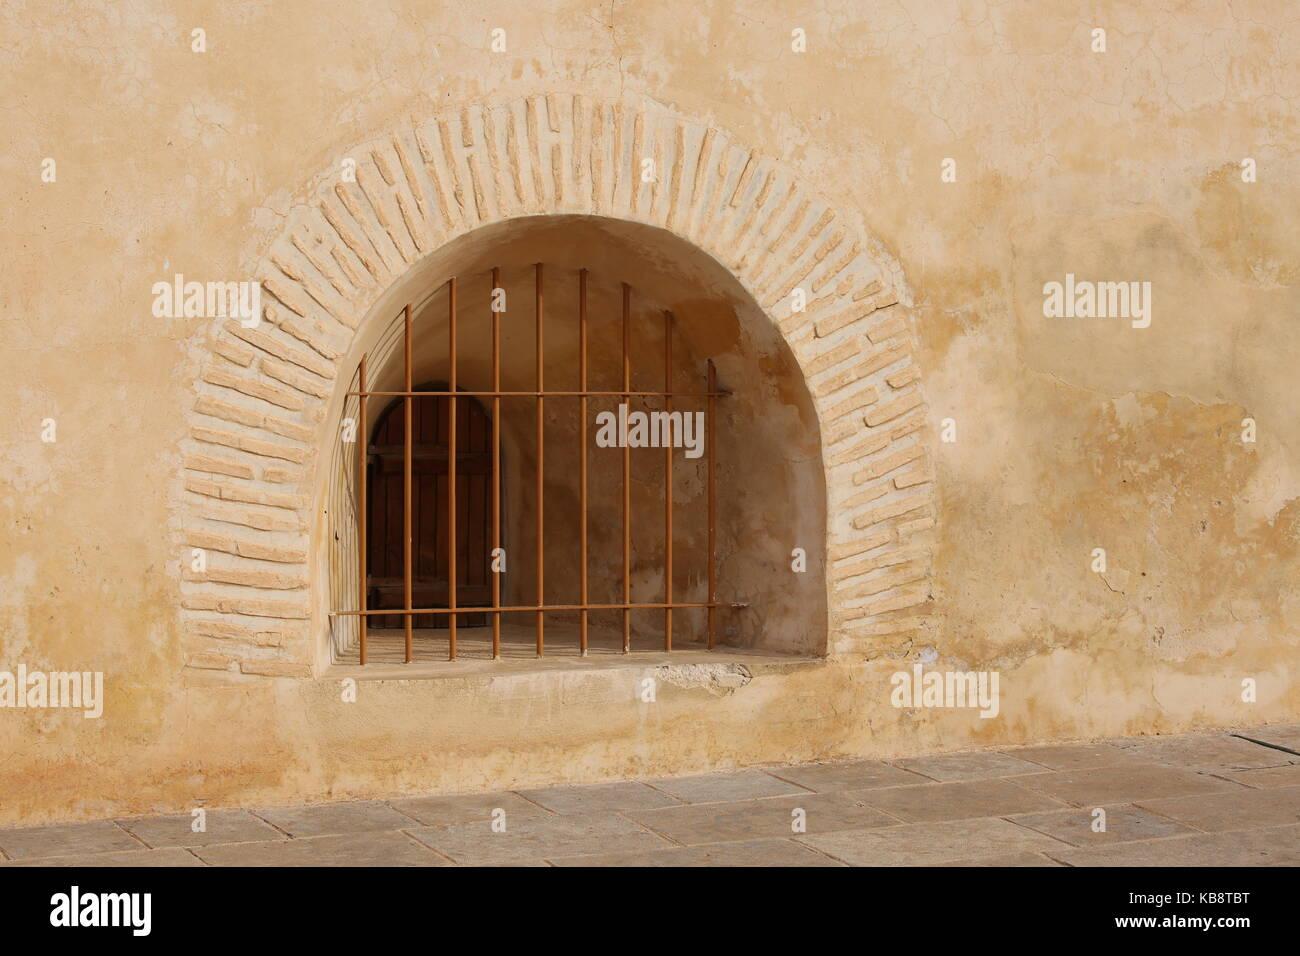 Vergittertes Fester in einer beigen Wand - Latticed fixed in a beige wall - Stock Image